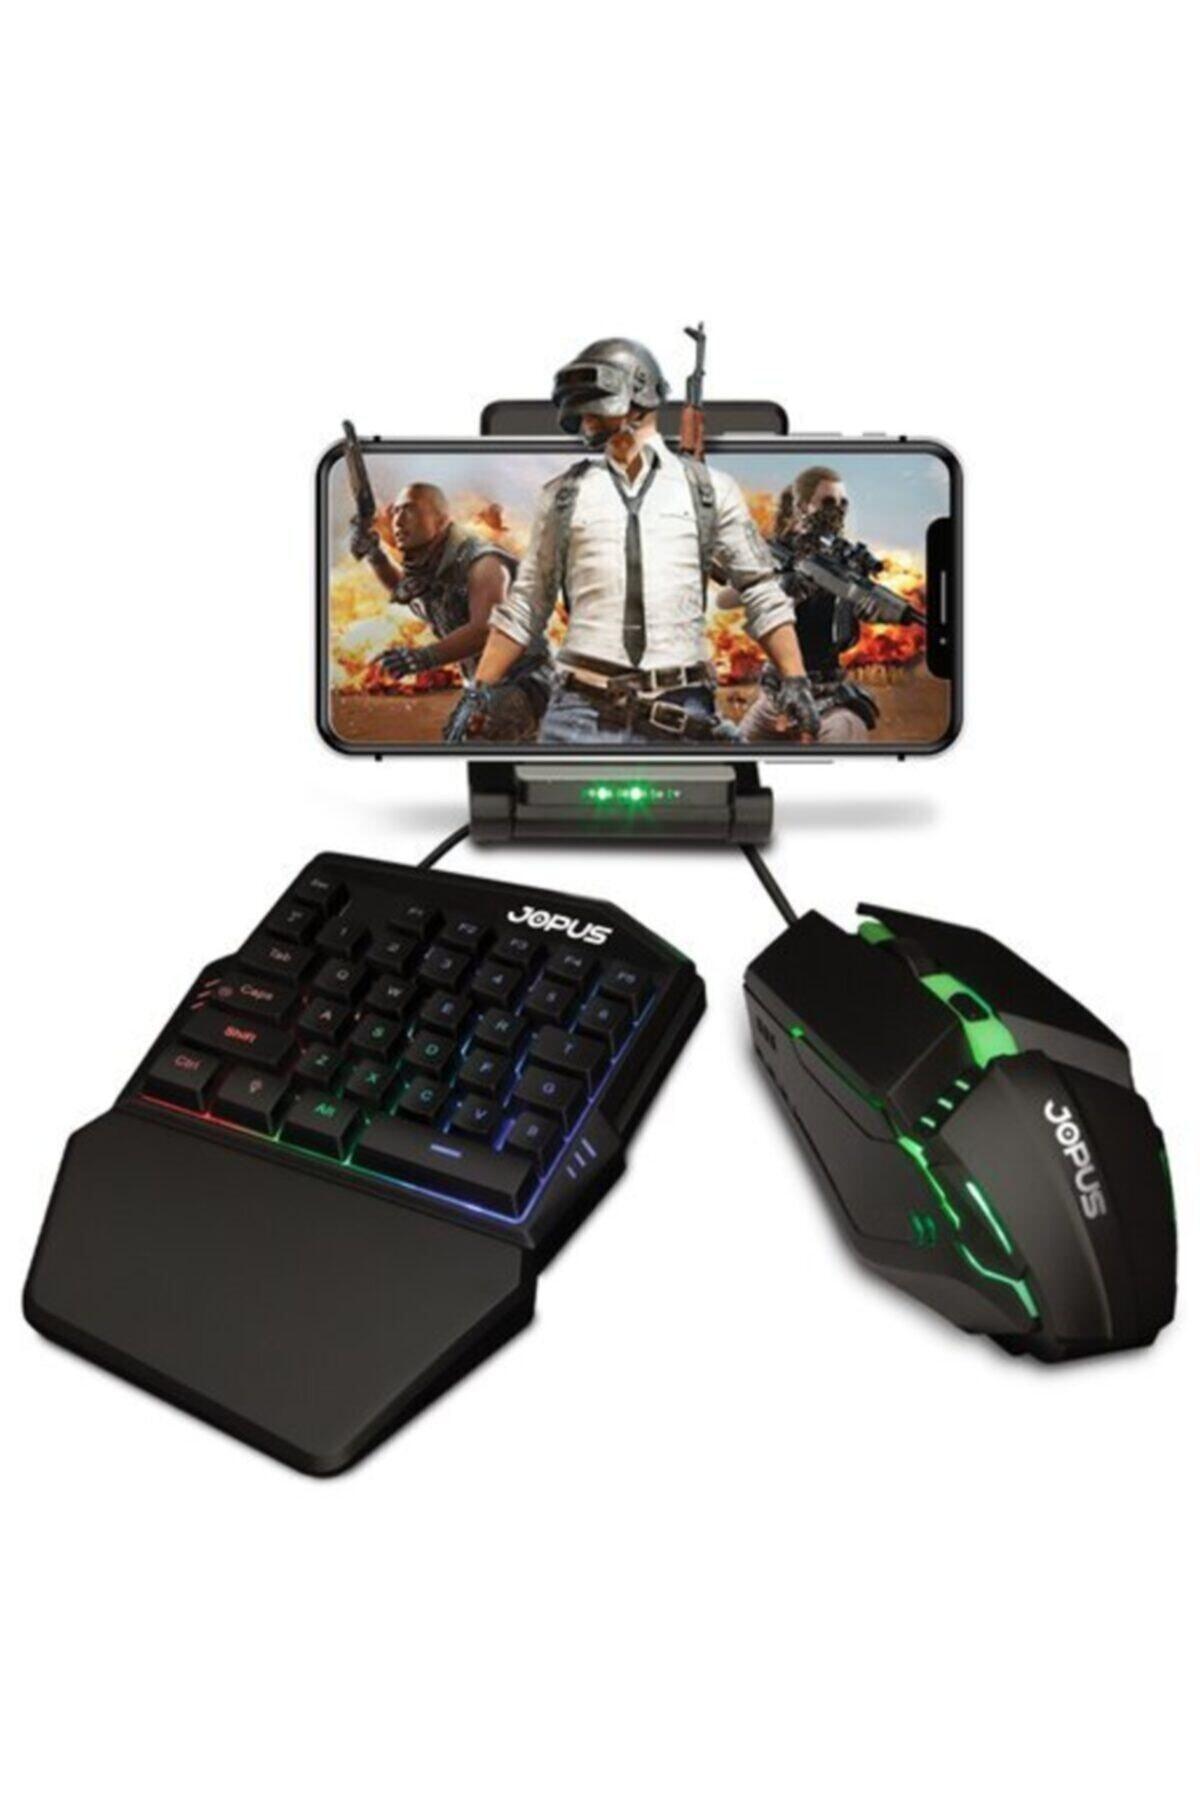 Jopus Sorcerer Gaming Set Klavye Ve Mouse Fare Seti Pubg Oyun Seti 1